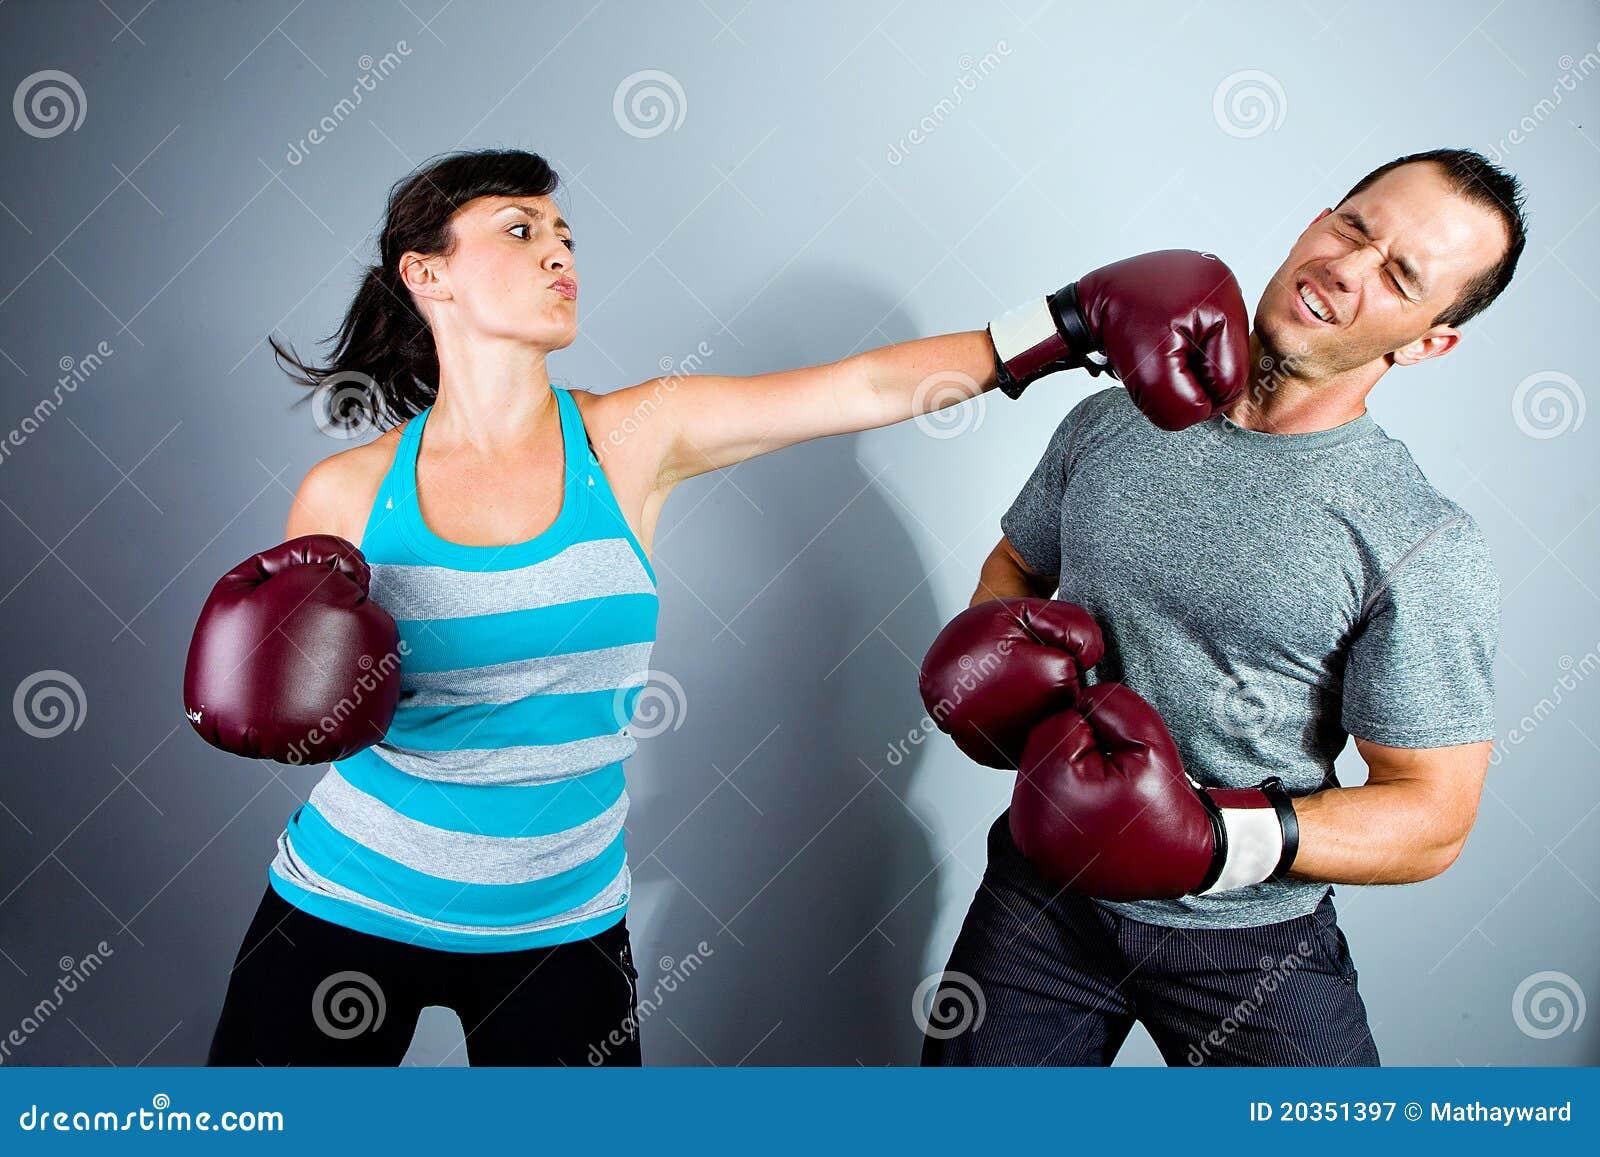 man punching woman